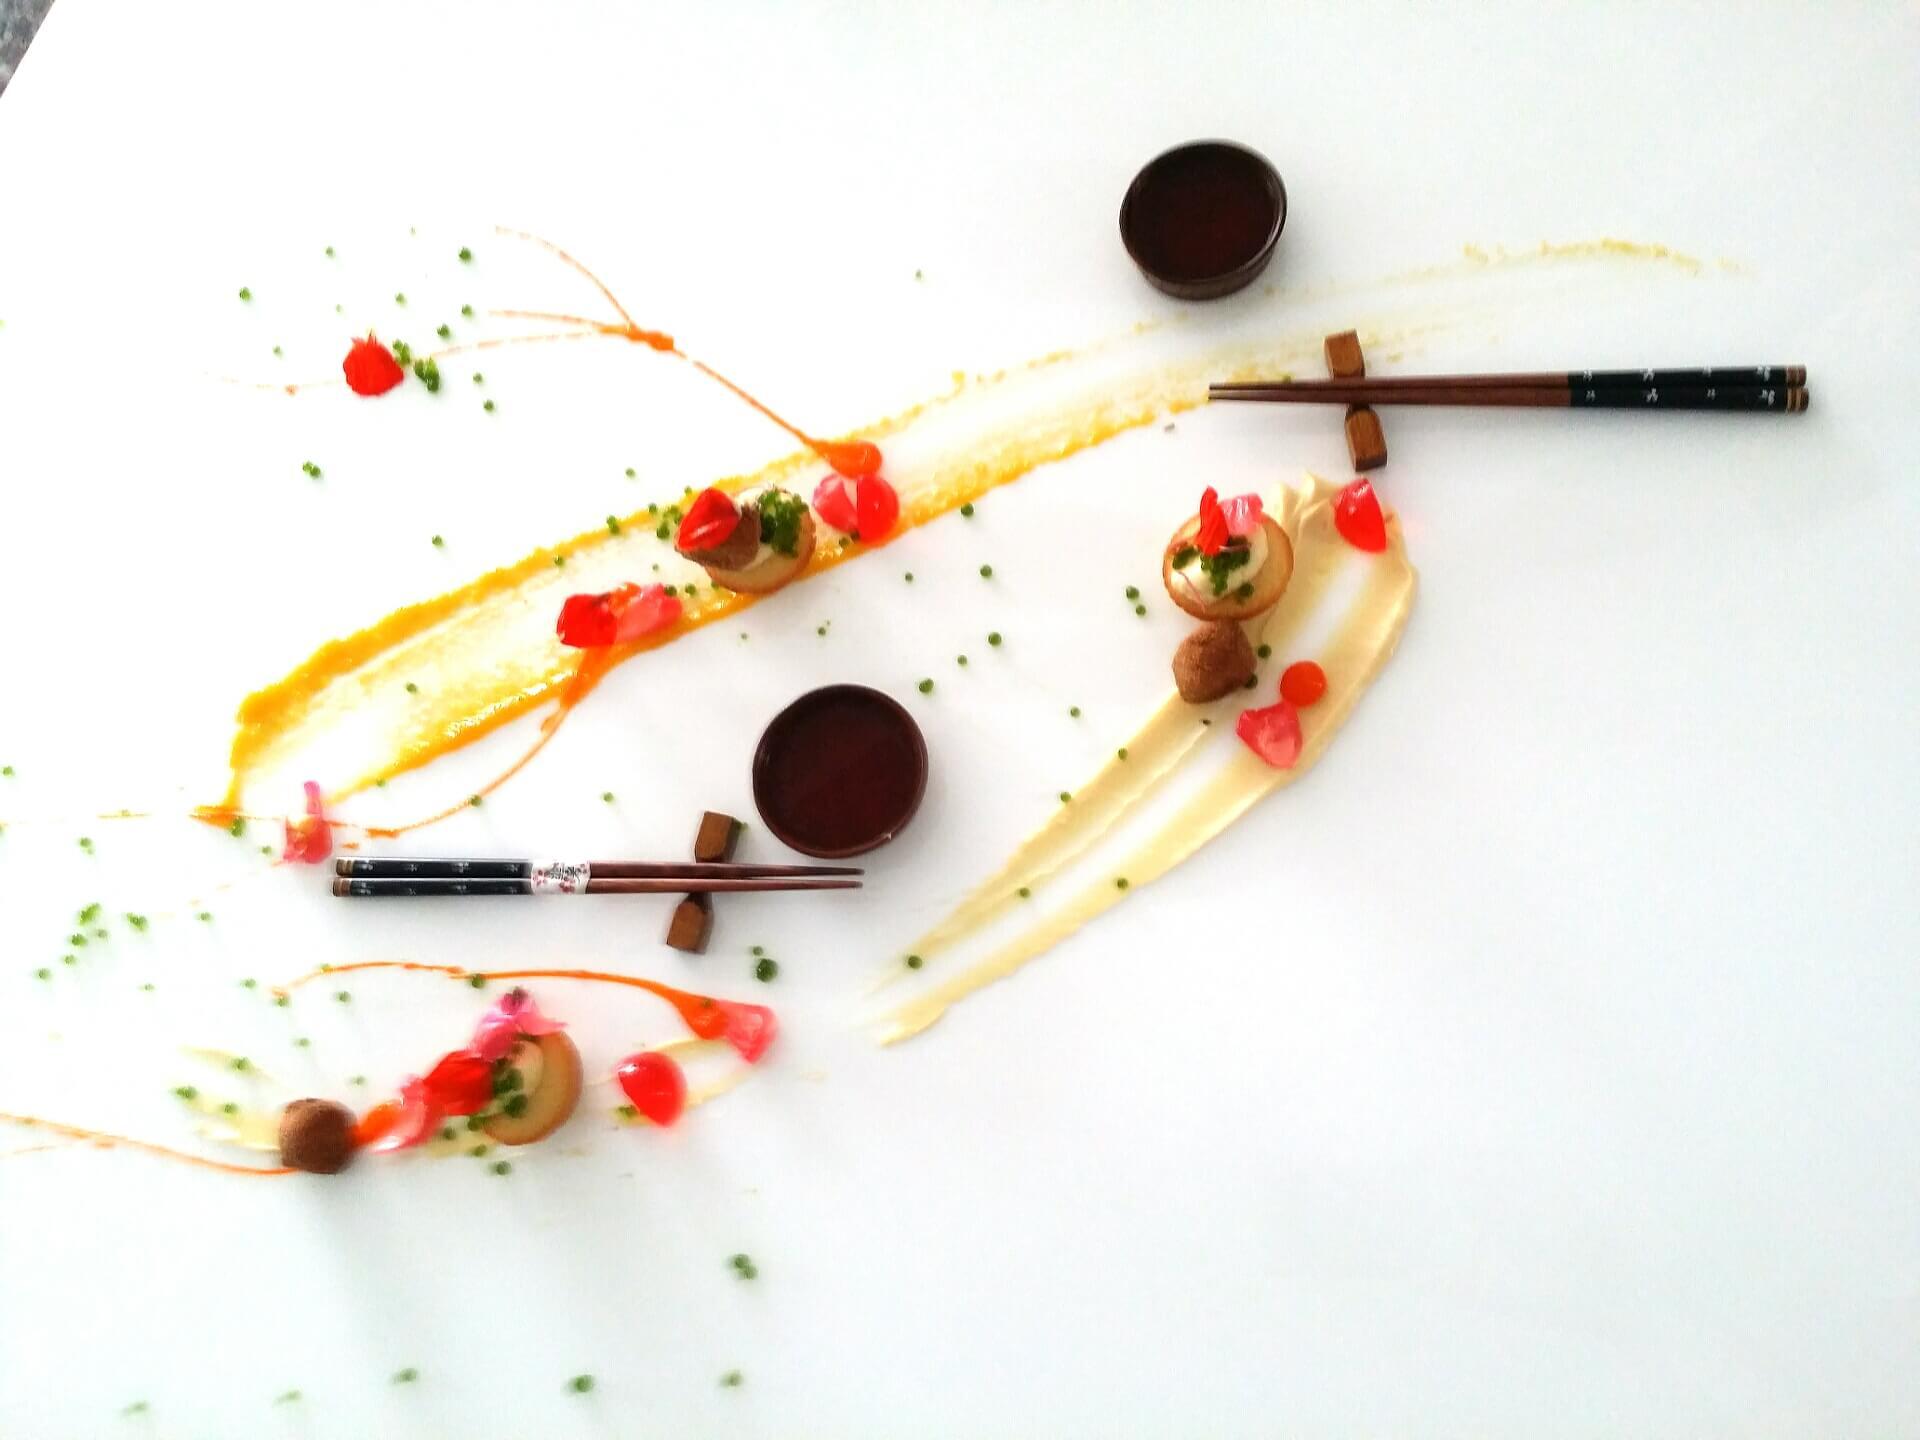 Dessert à l'assiette litchi-rose-soja by Vincent Catala Chef Pâtissier & Cuisinier/French Private Cuisine & Pastry Chef - Catering in Miami